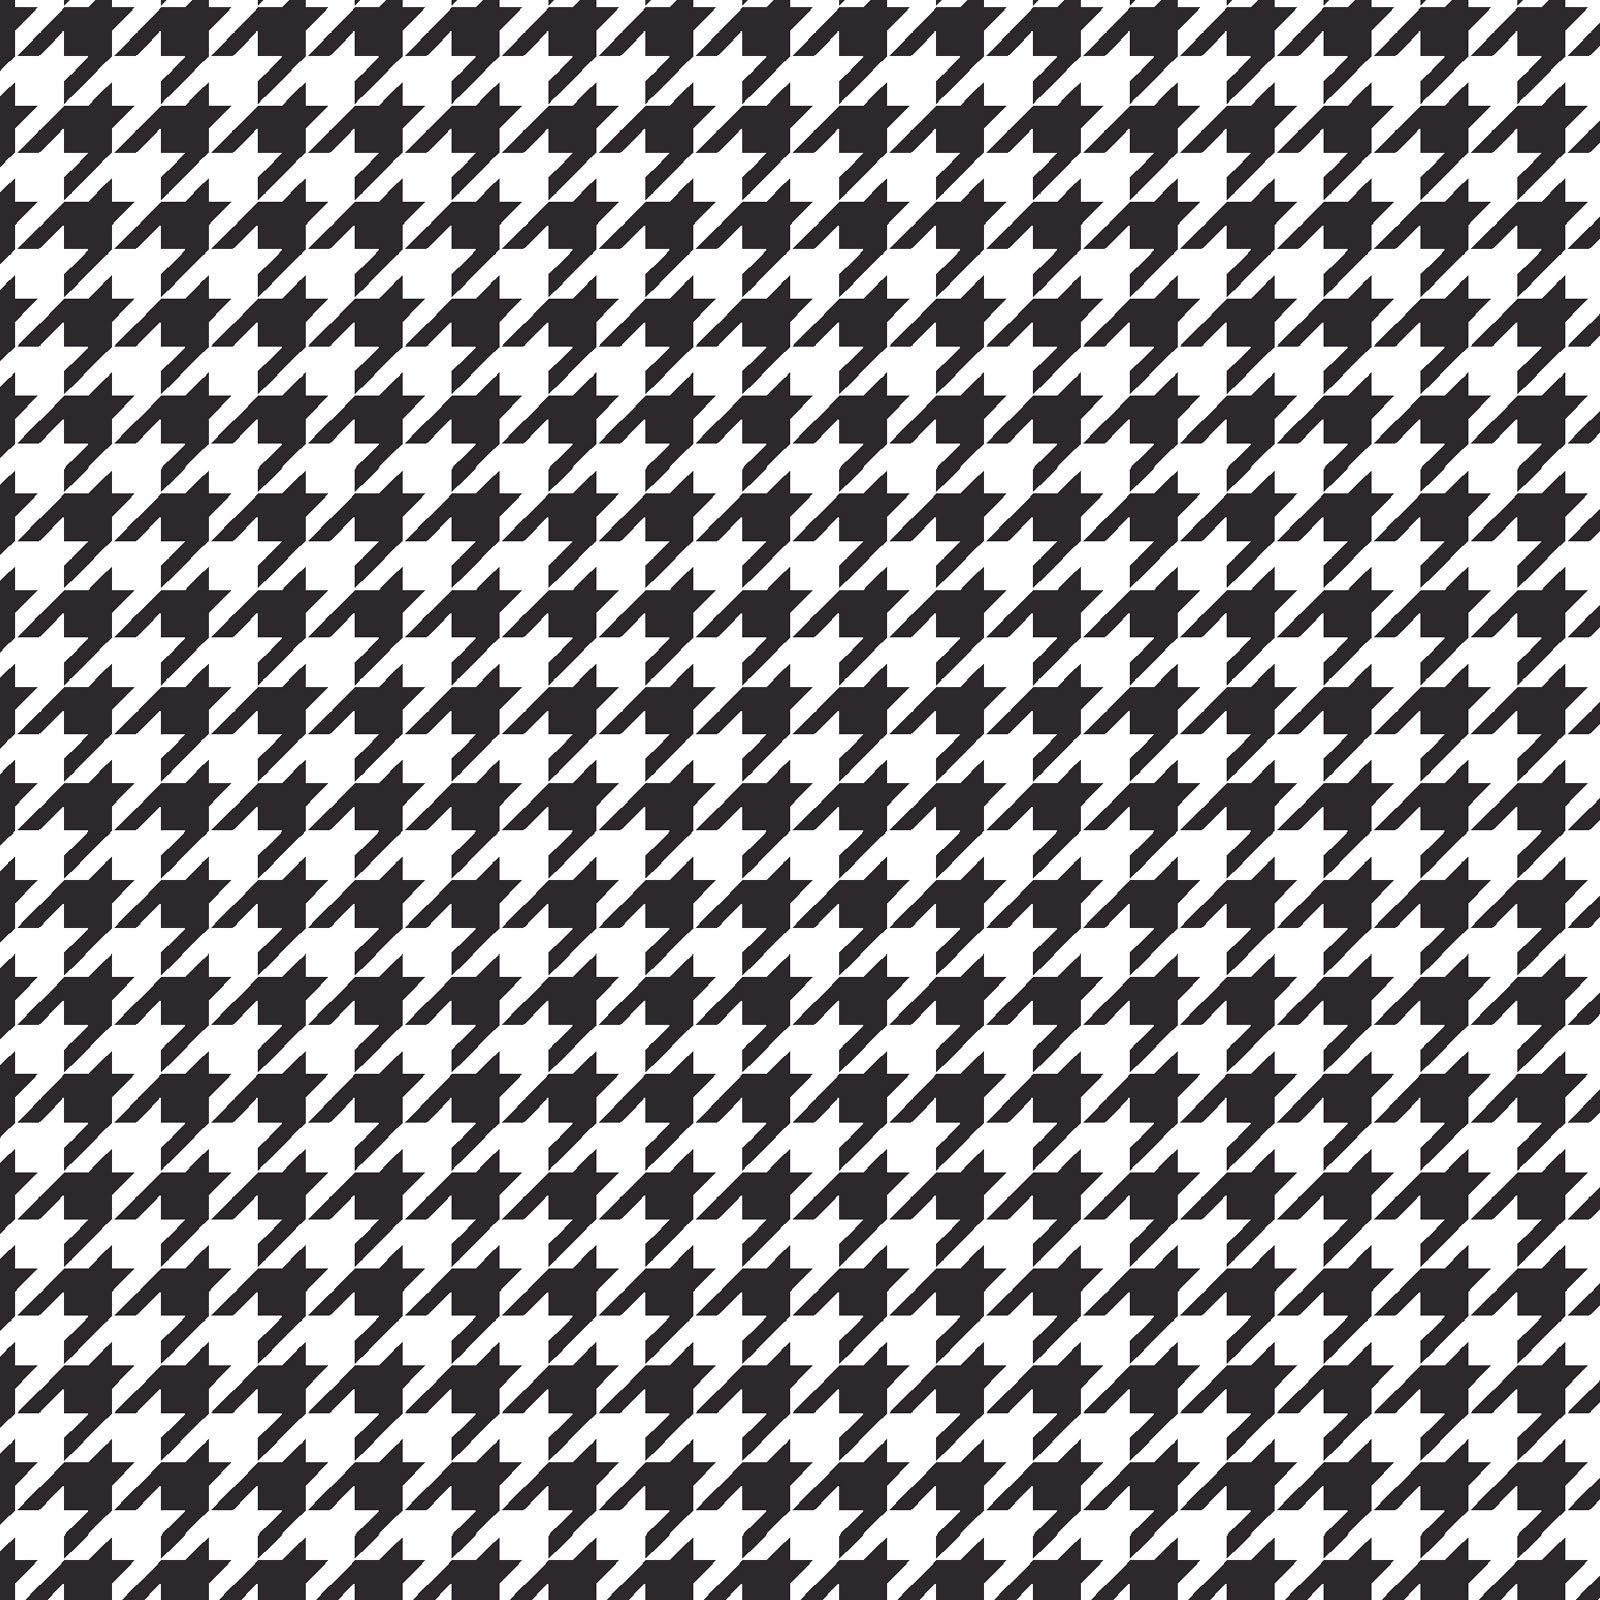 KimberBell Basics Black Houndstooth 8206M-J